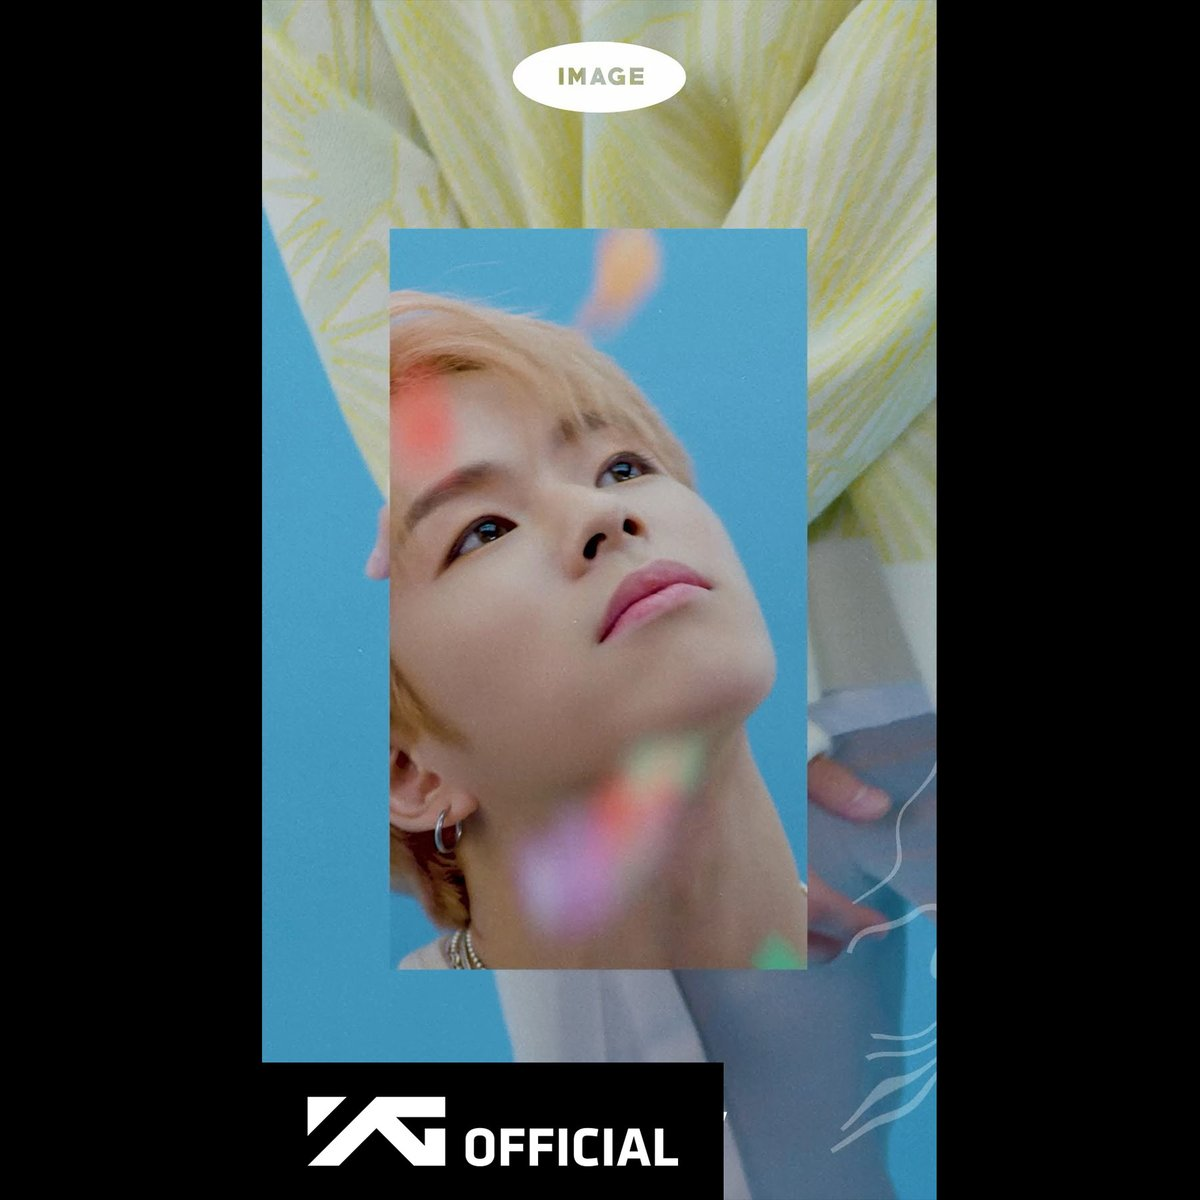 #TREASURE PR VIDEO <YOON JAE HYUK> 1st SINGLE ALBUM 'THE FIRST STEP : CHAPTER ONE' ✅2020.08.07 6PM 📺NAVER TV : tv.naver.com/v/15081354 🎬YouTube : youtu.be/cSVgqhr7Be4 #트레저#1stSINGLEALBUM #THEFIRSTSTEP_CHAPTERONE #PR_VIDEO #윤재혁#YOONJAEHYUK #DEBUT #YG